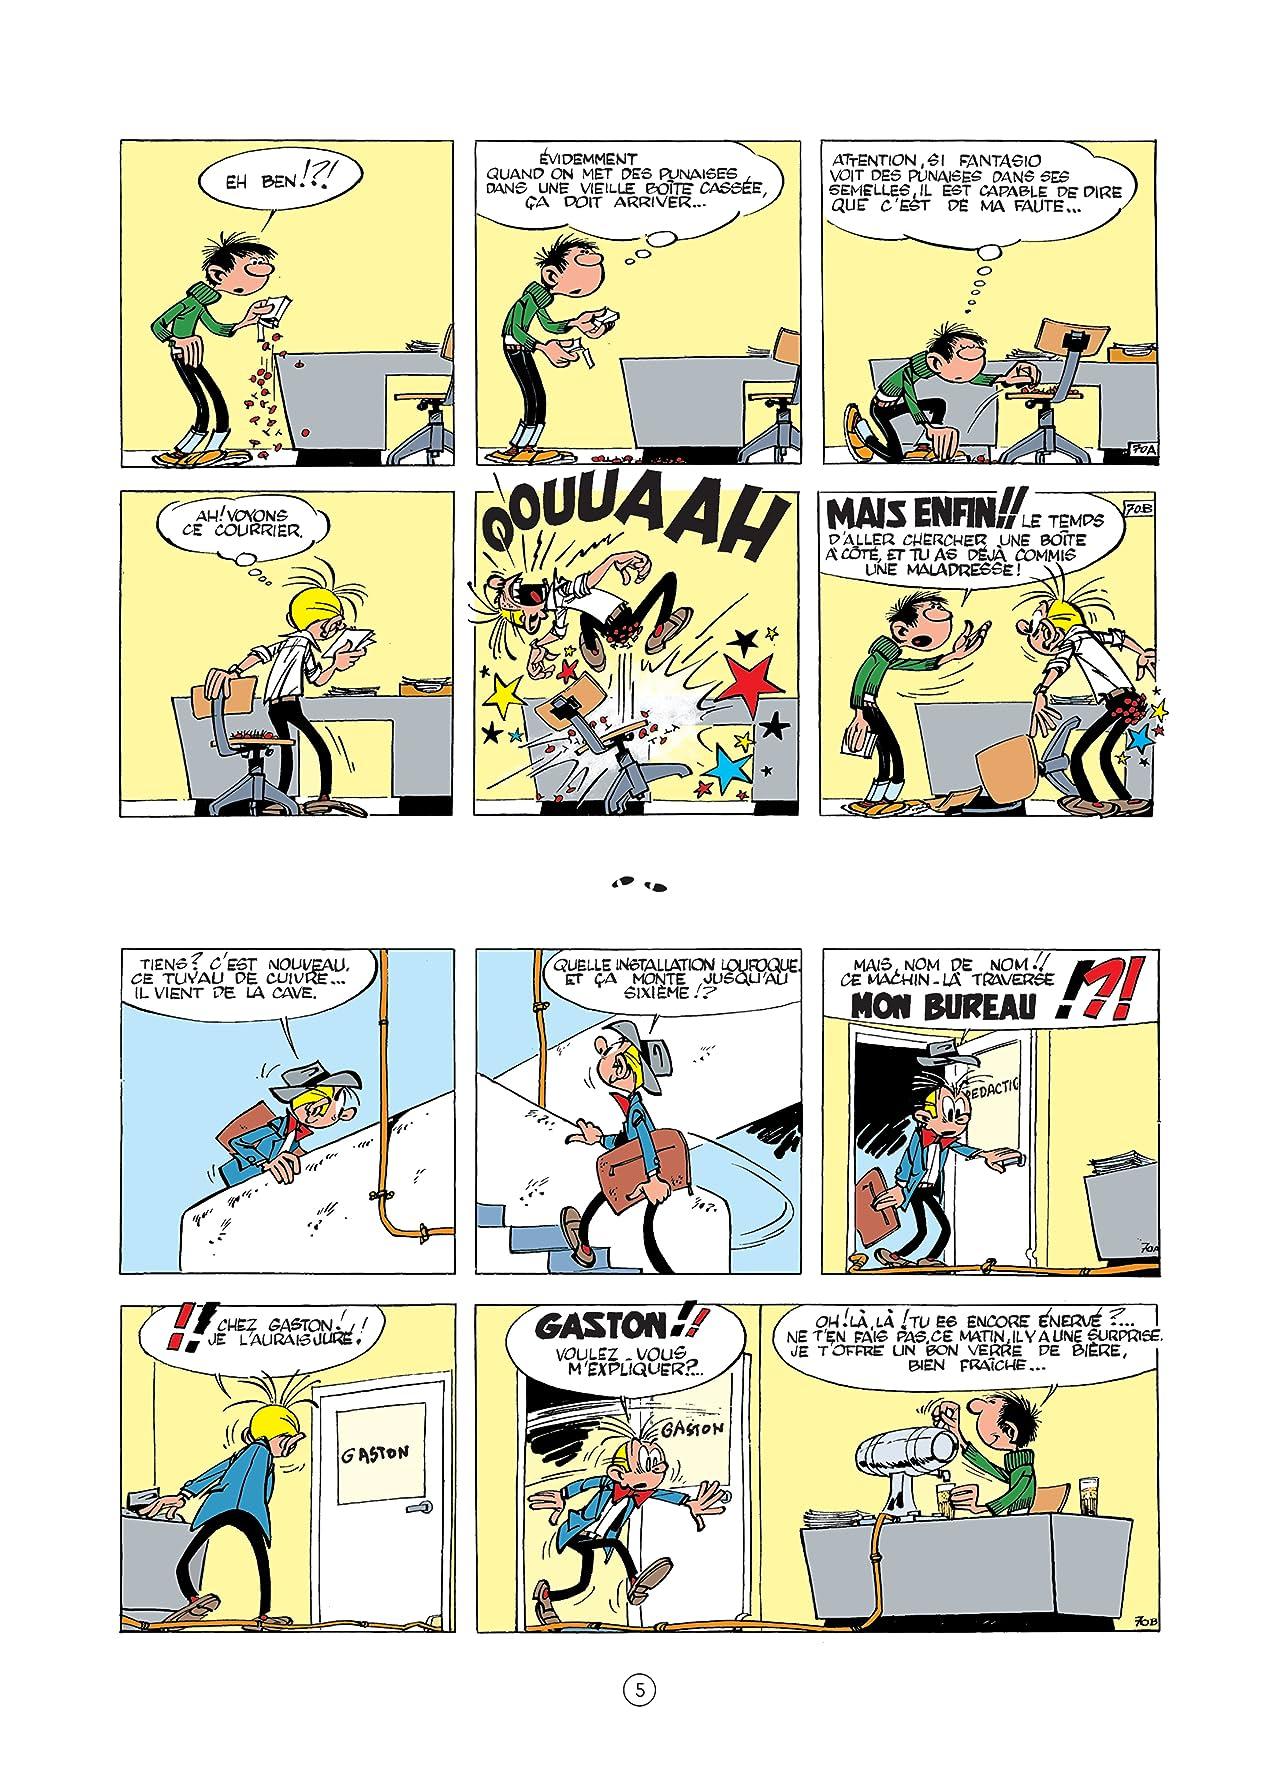 Gaston (Edition 2018) Vol. 2: Gare aux gaffes